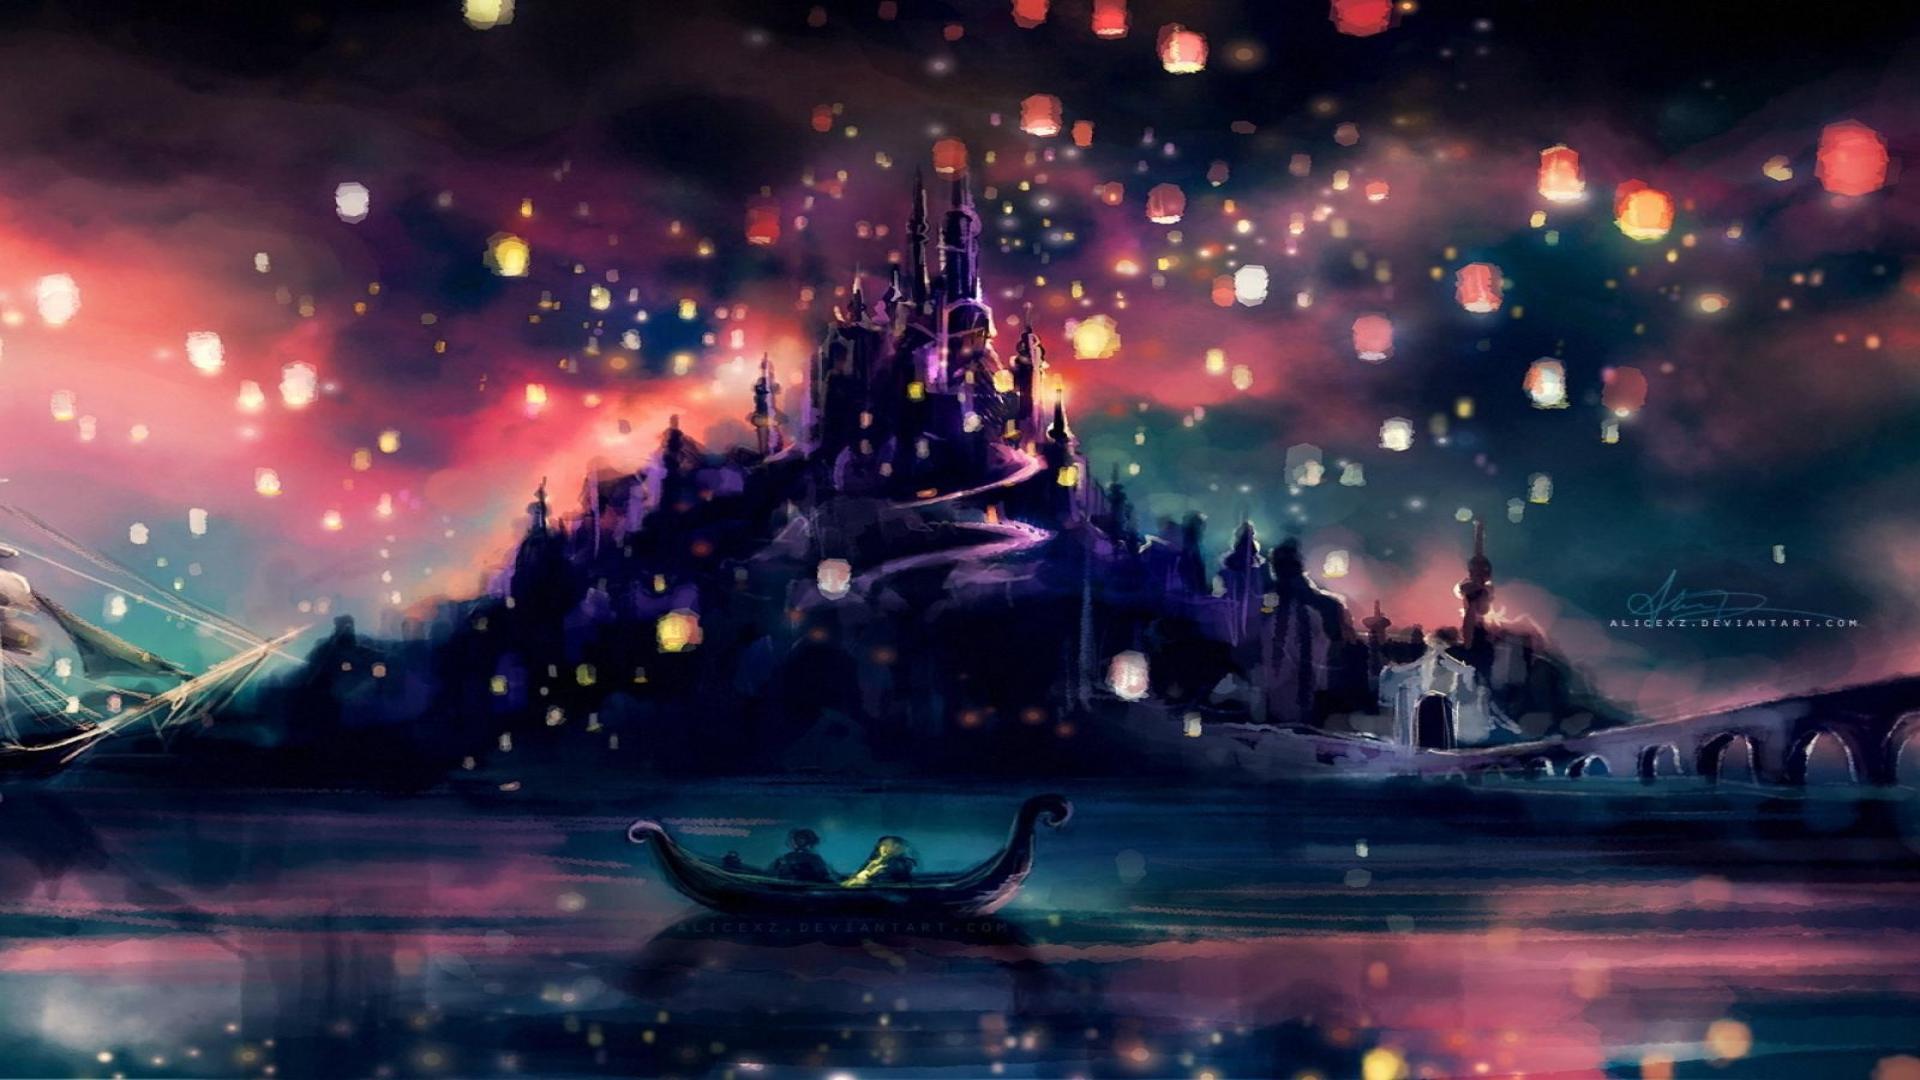 Harry Potter Aesthetic Wallpaper Pc / Desktop Wallpaper ...